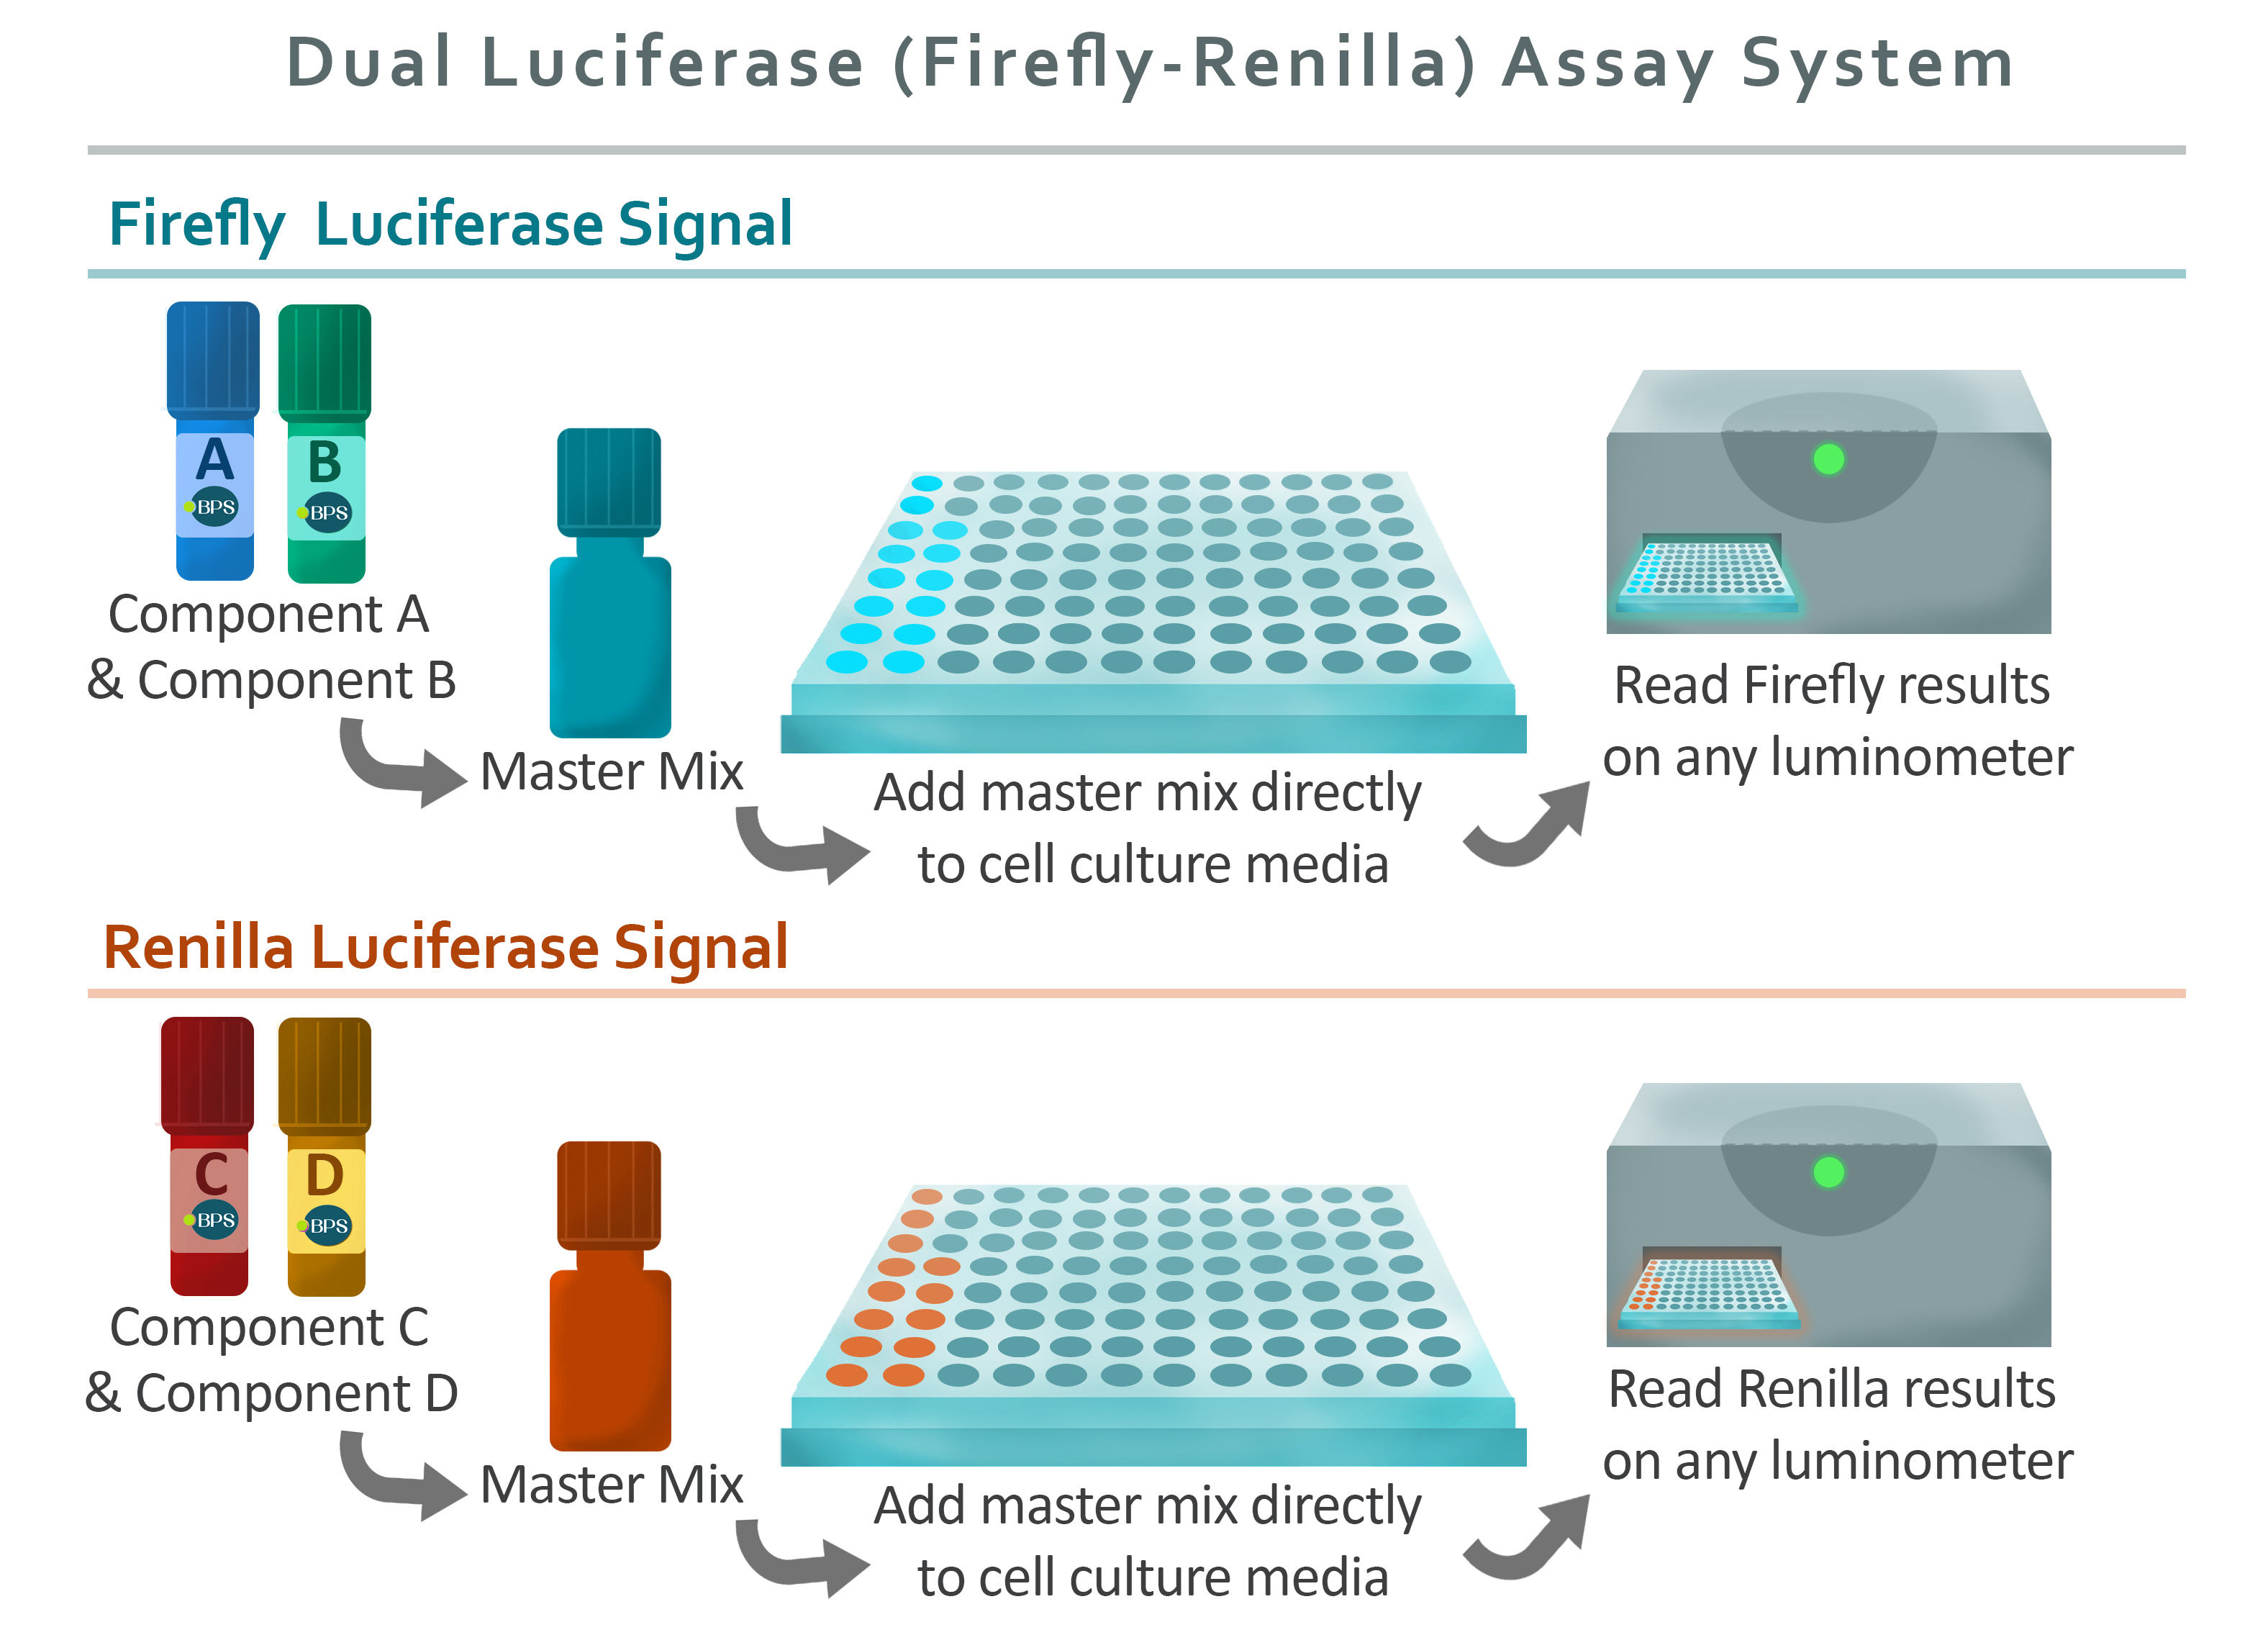 Dual Luciferase Assay System